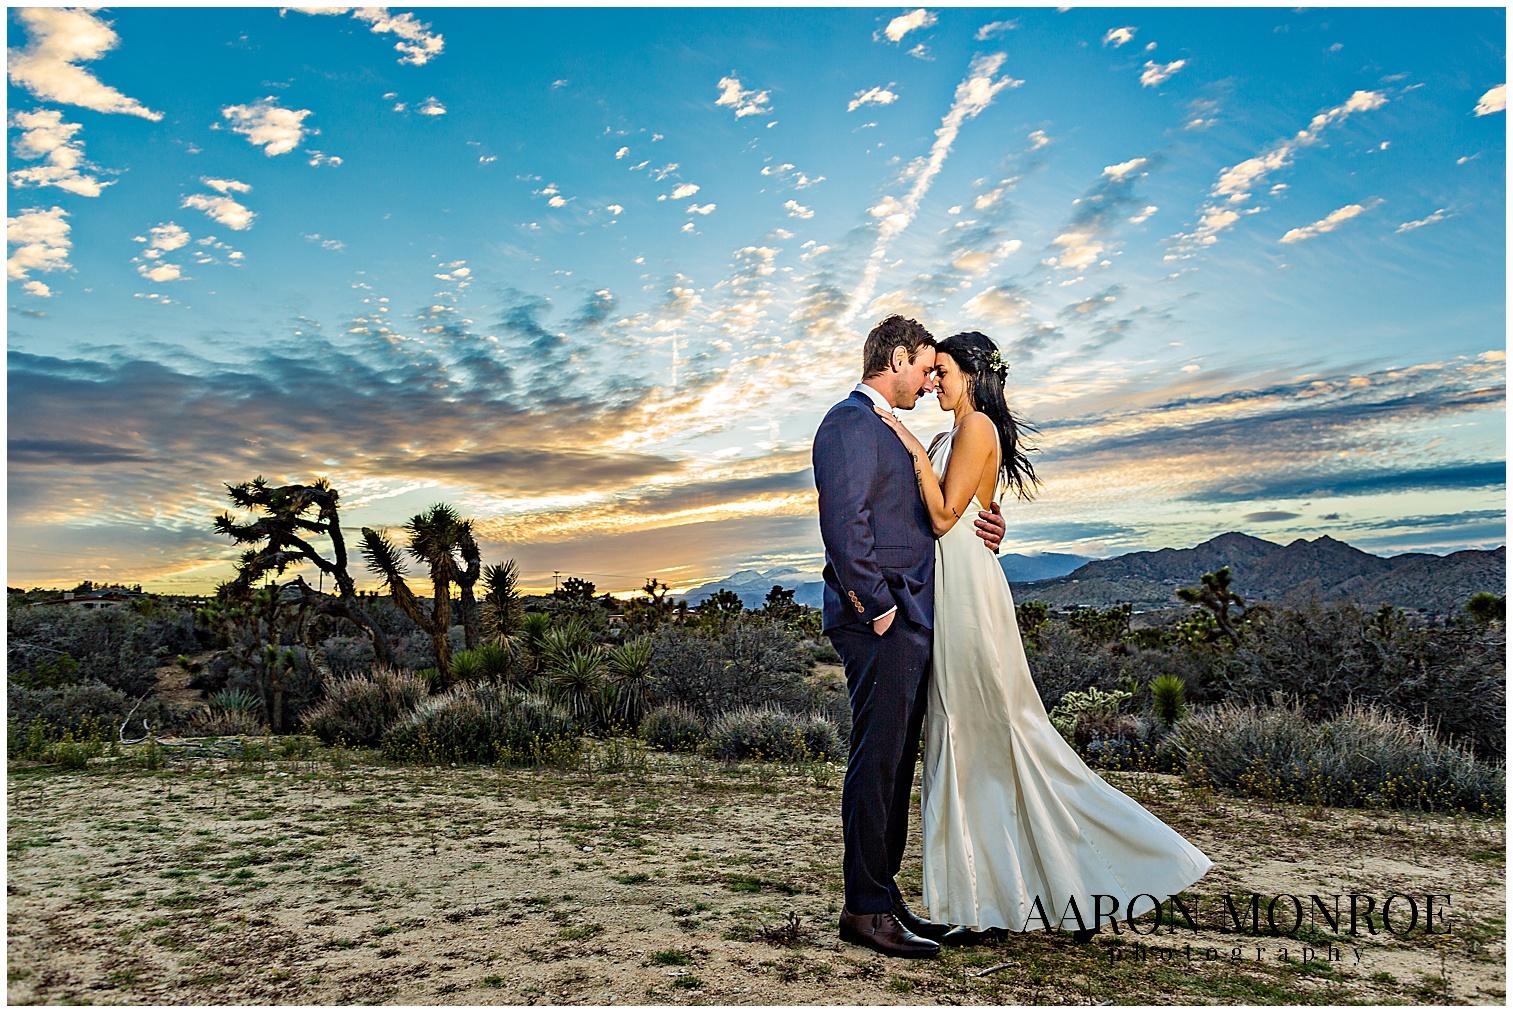 los_angeles_wedding_photographer_1264.jpg